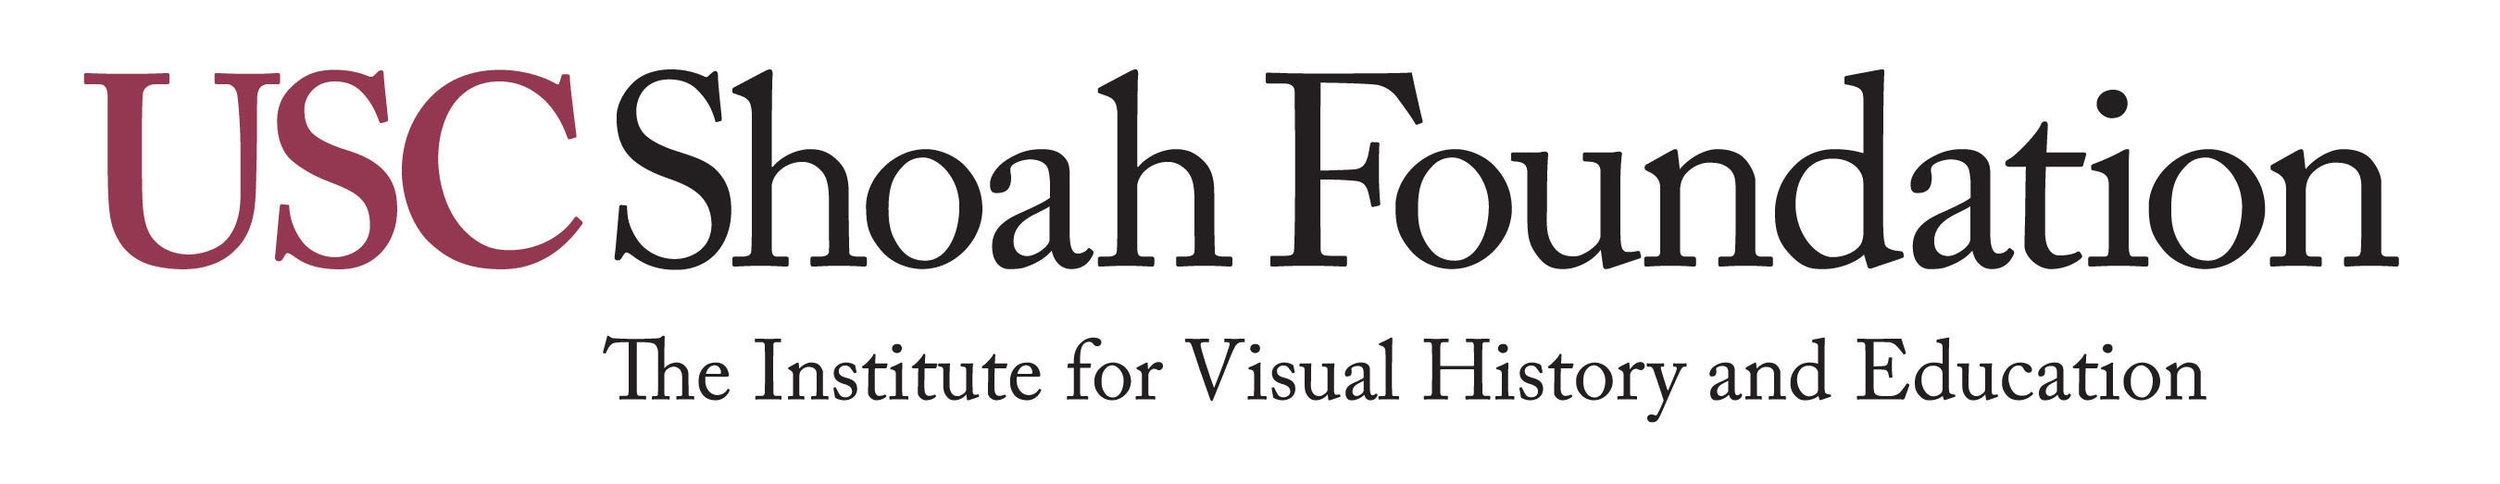 USC Shoah Foundation Logo.jpg